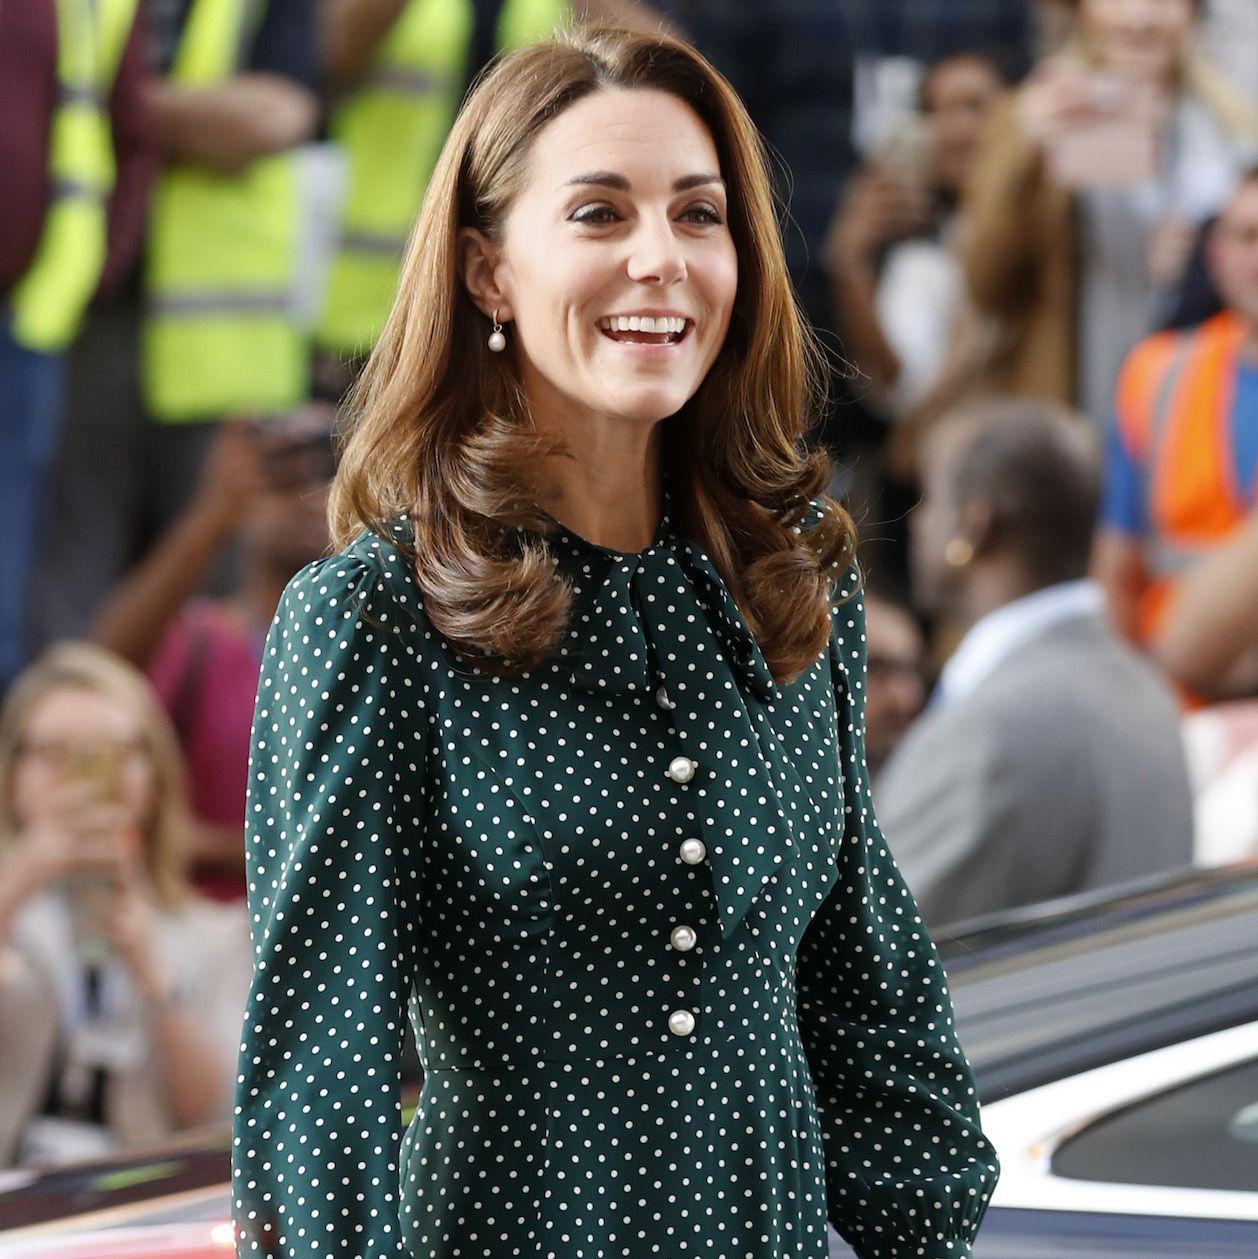 Kate Middleton Struck the Festive-But-Chic Balance in a Green Polka Dot Dress from L.K.Bennett